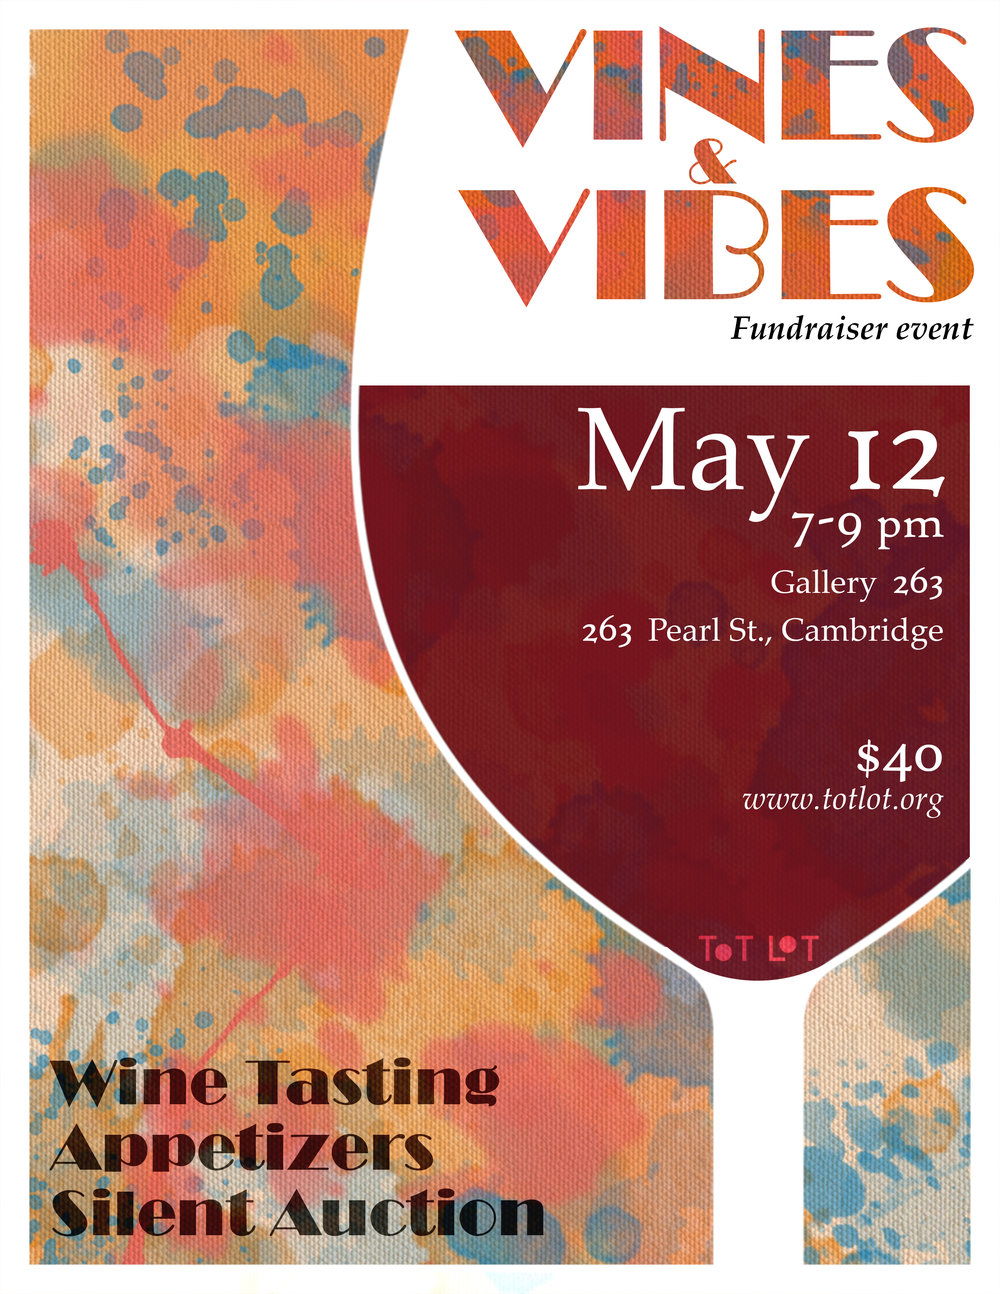 2018.05.12 - Vines & Vibes 0 (1).jpg